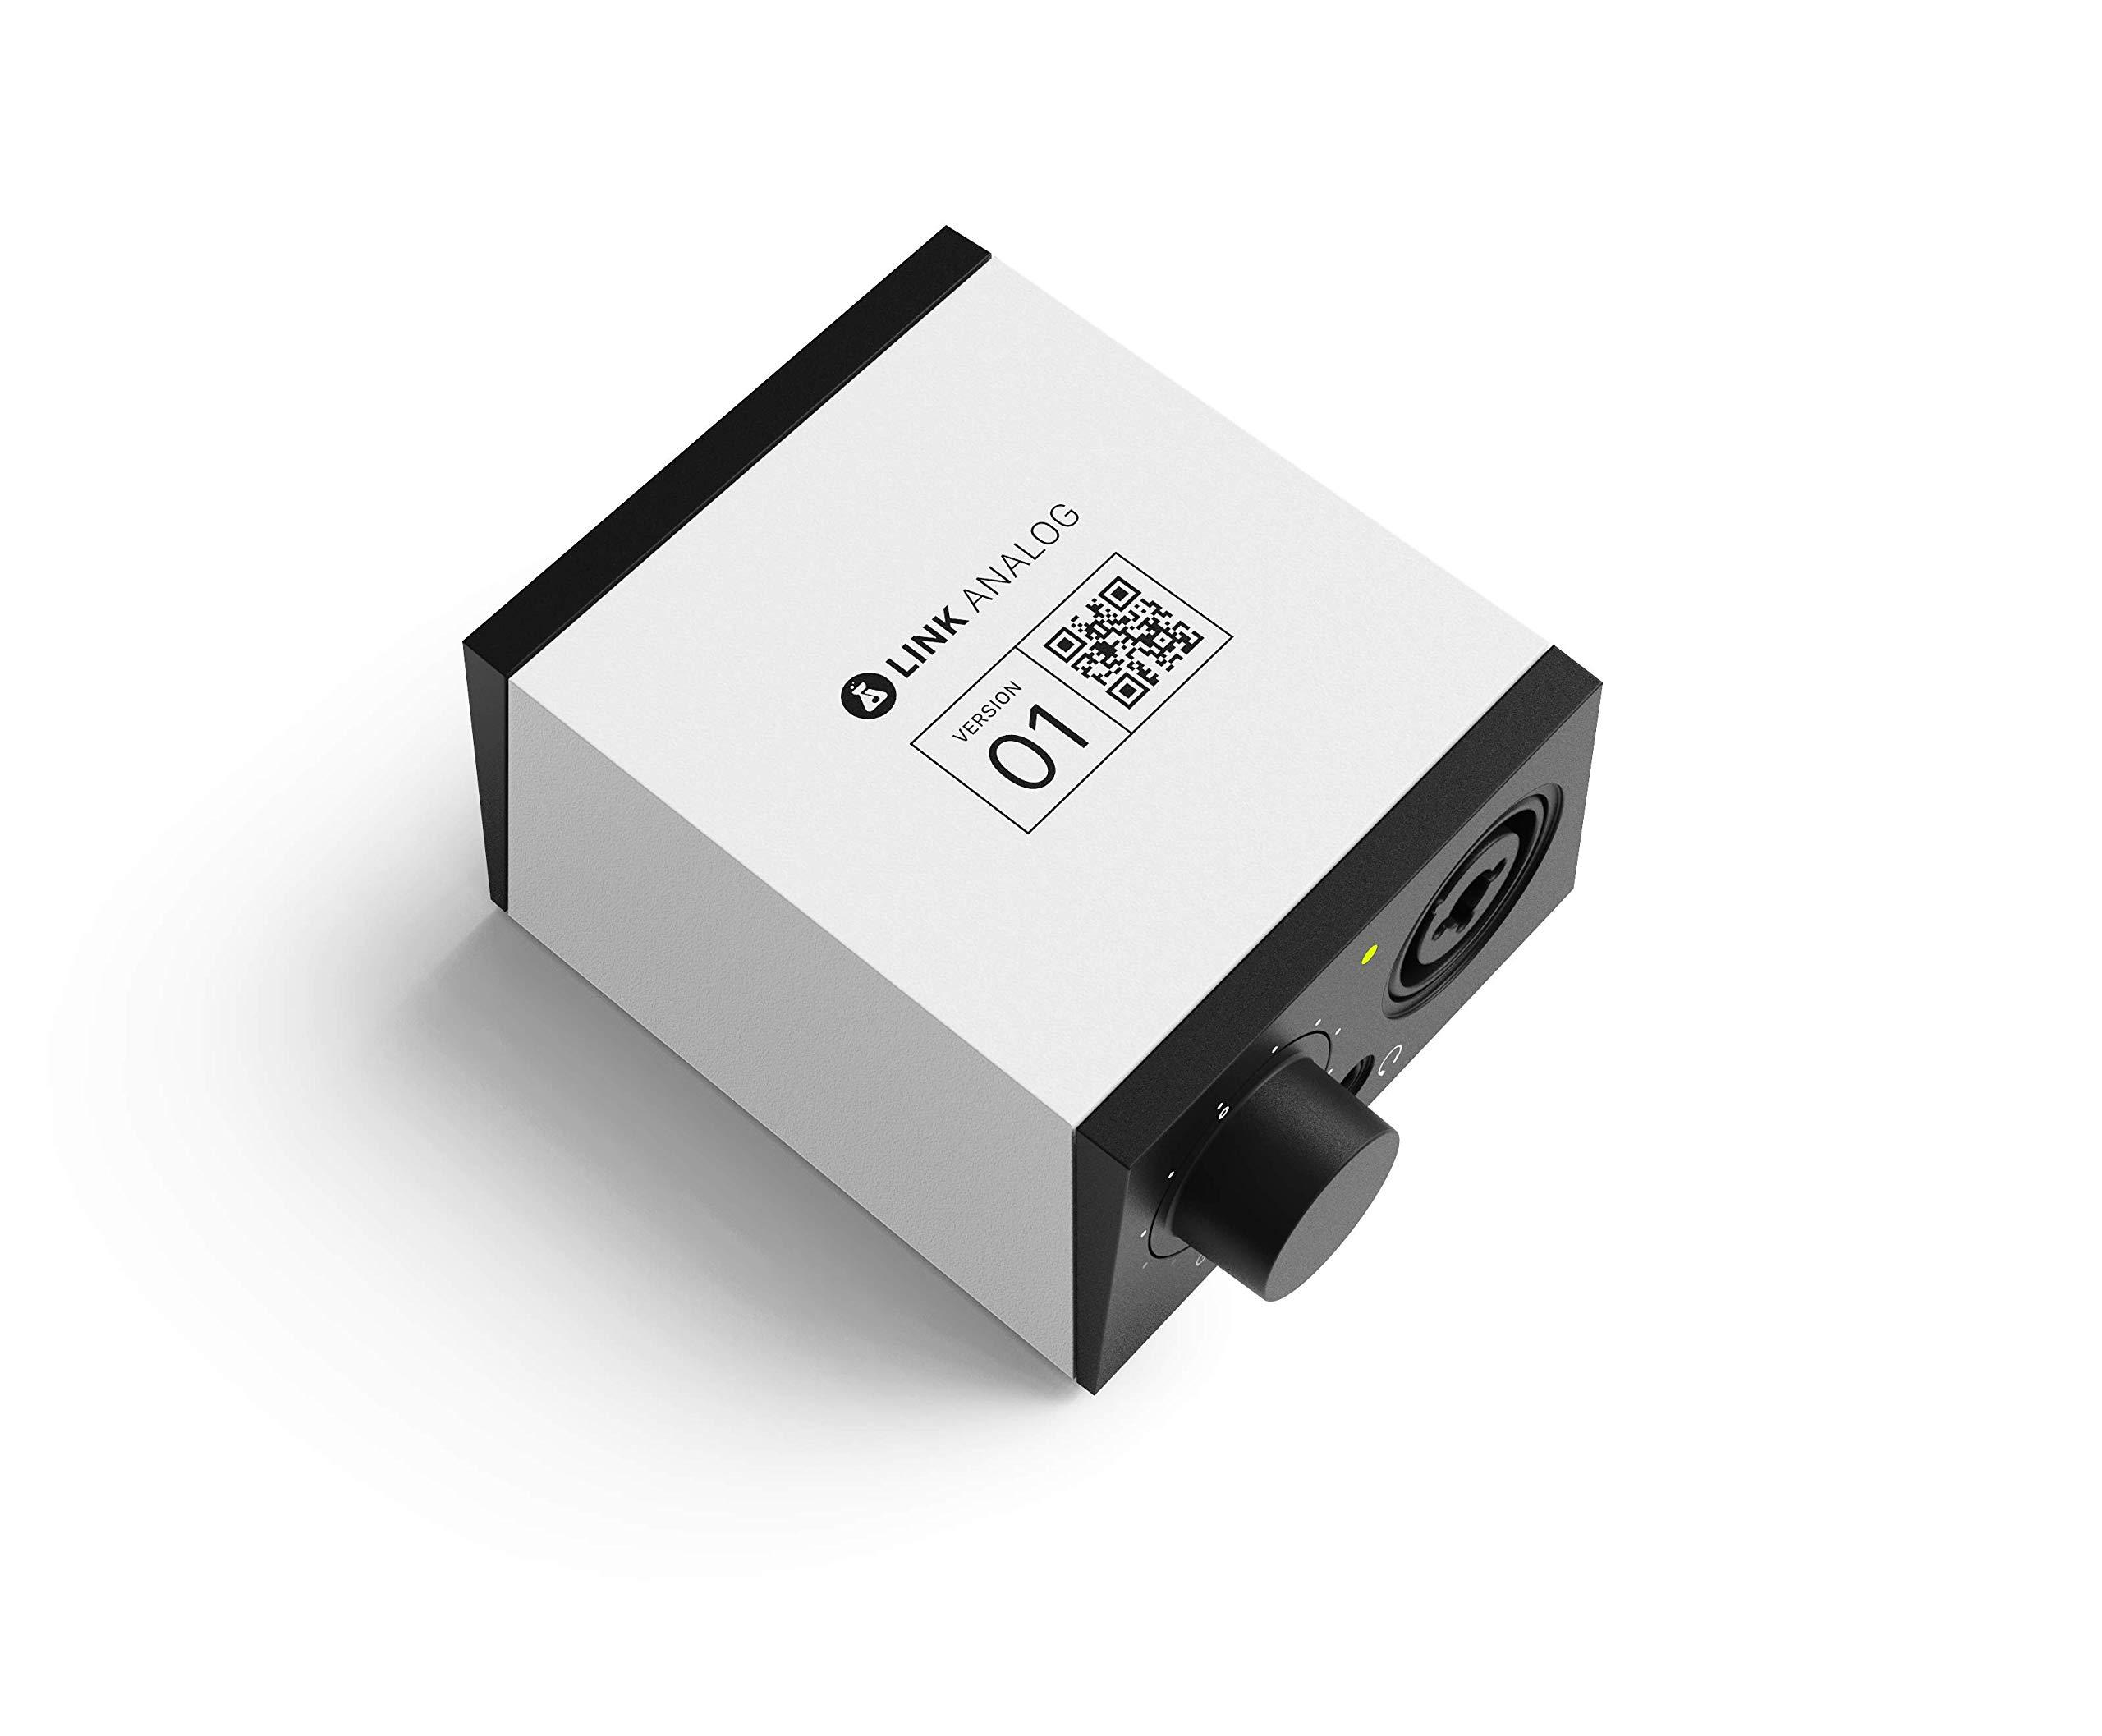 BandLab Link Series Audio Interface BLB-01100